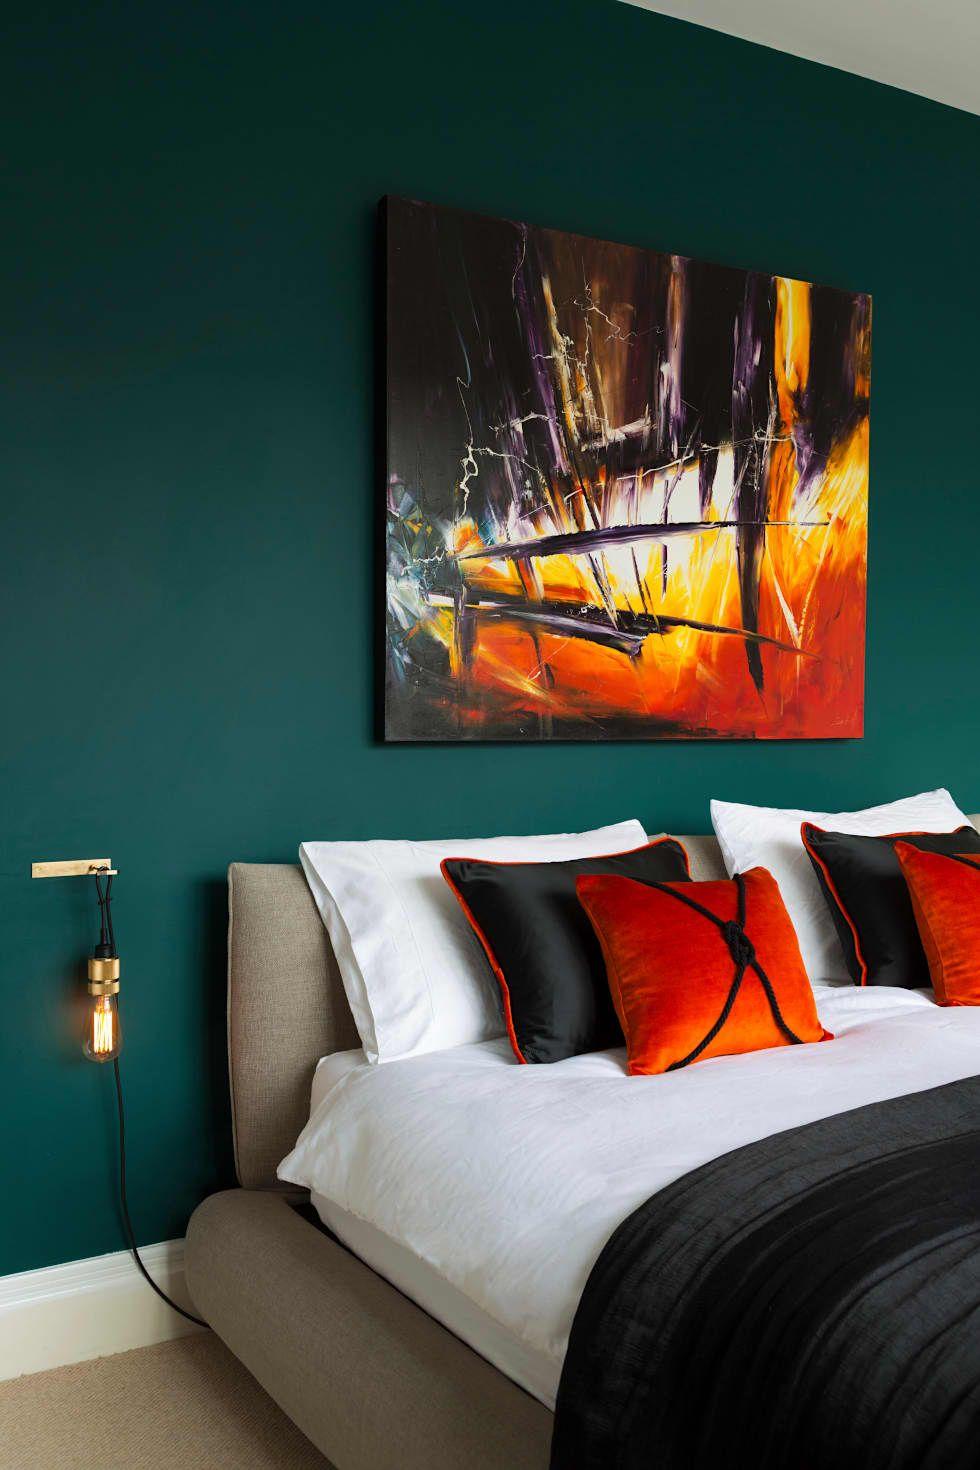 Interior Design Ideas Redecorating Remodeling Photos Single - Single man bedroom design